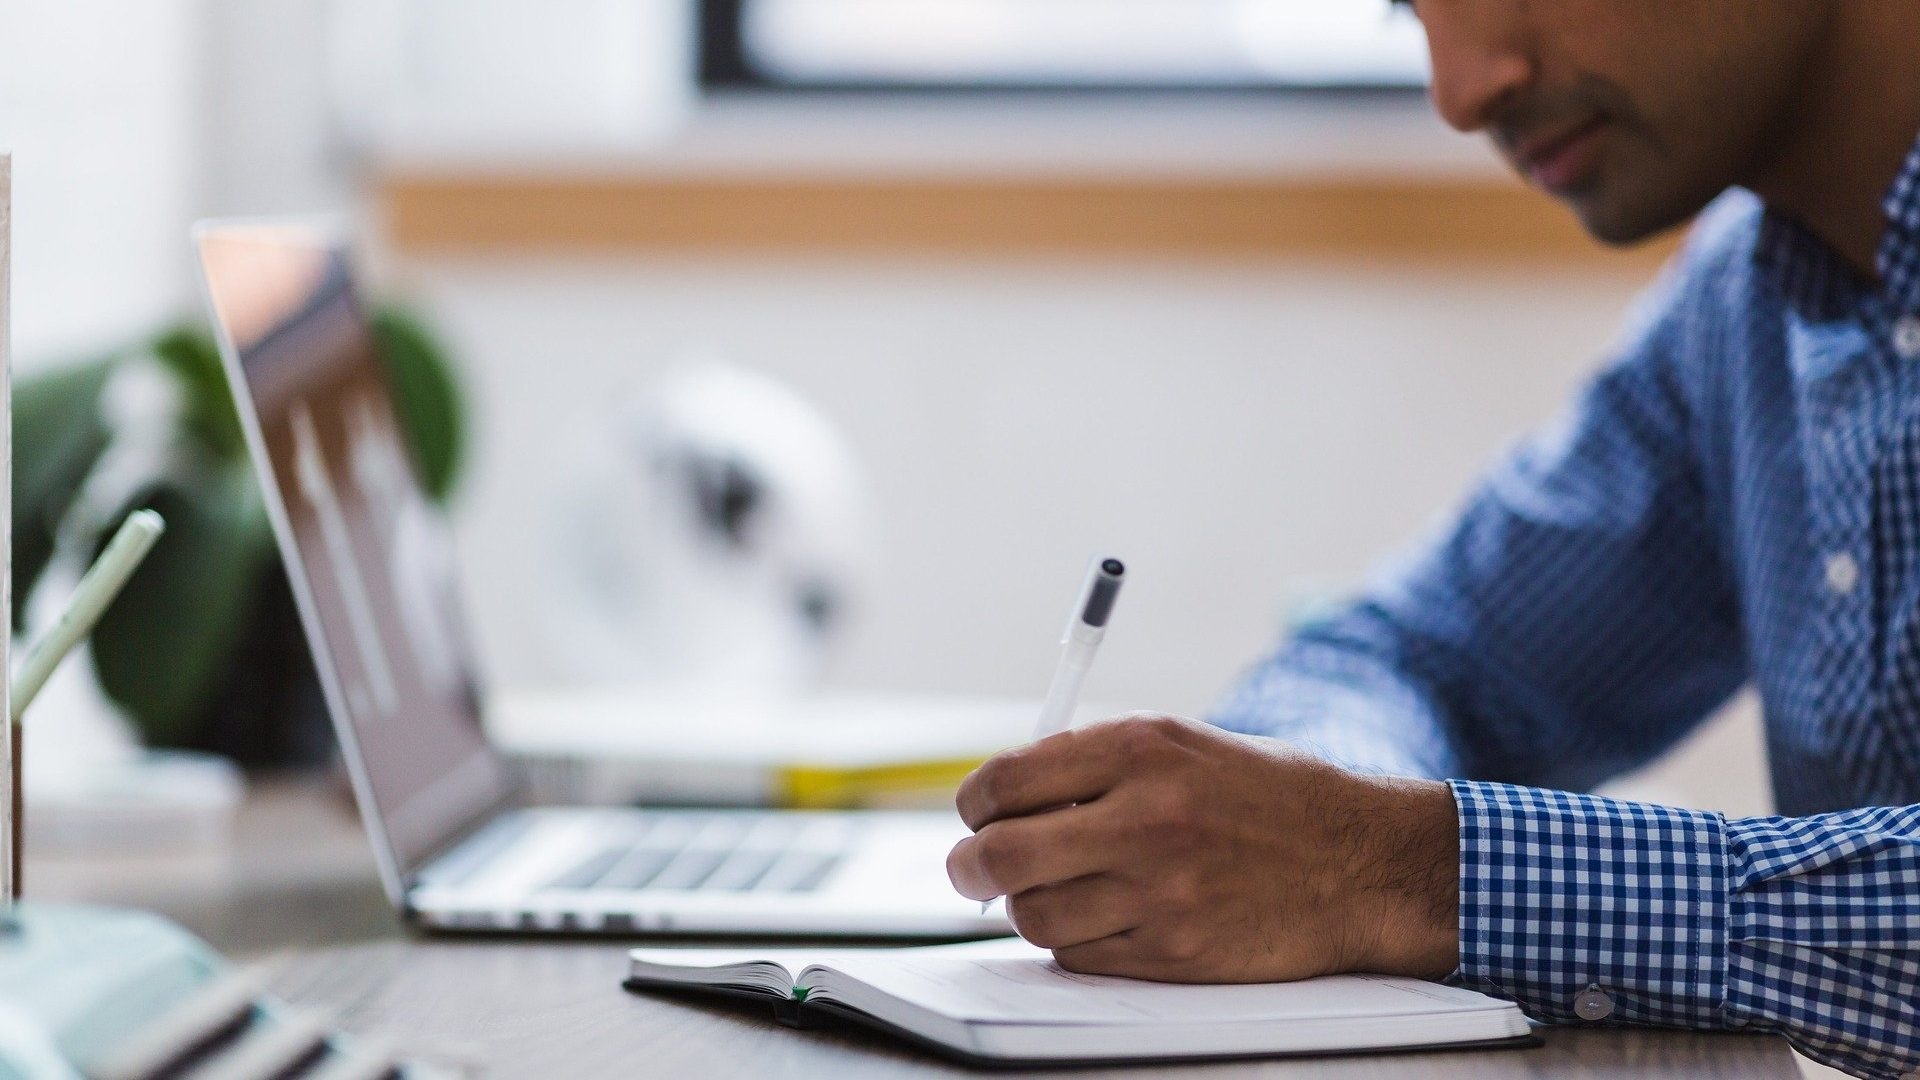 Image: man working at computer